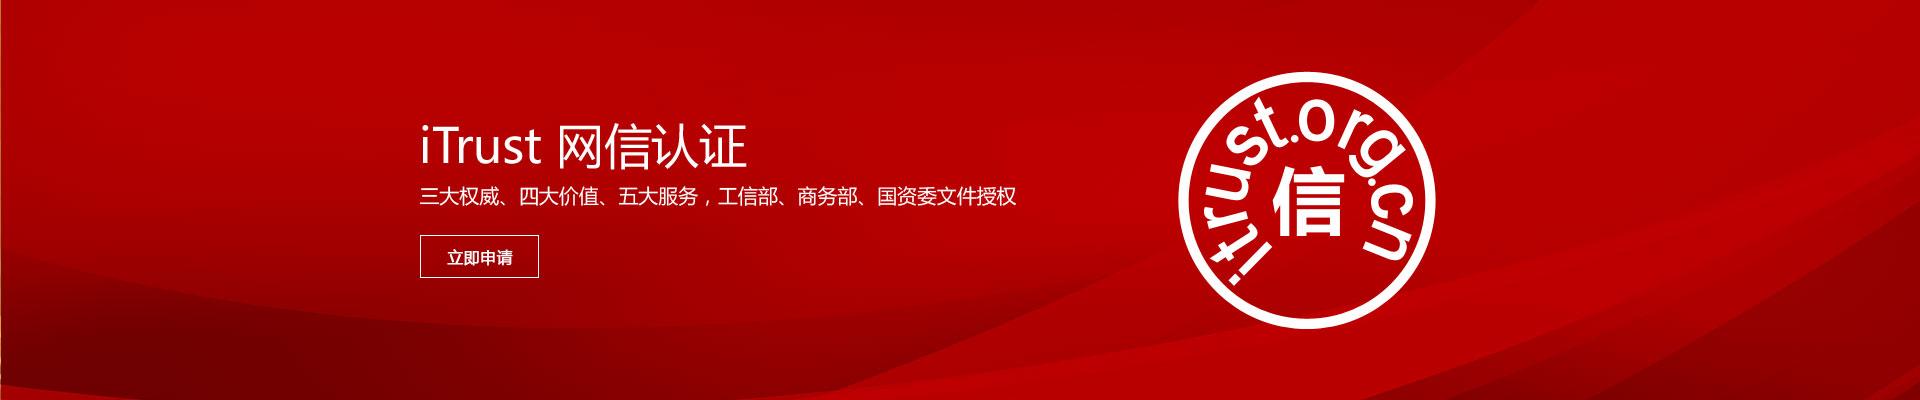 iTrust网信认证,网信认证,网站网信认证,网信验证,iTrust